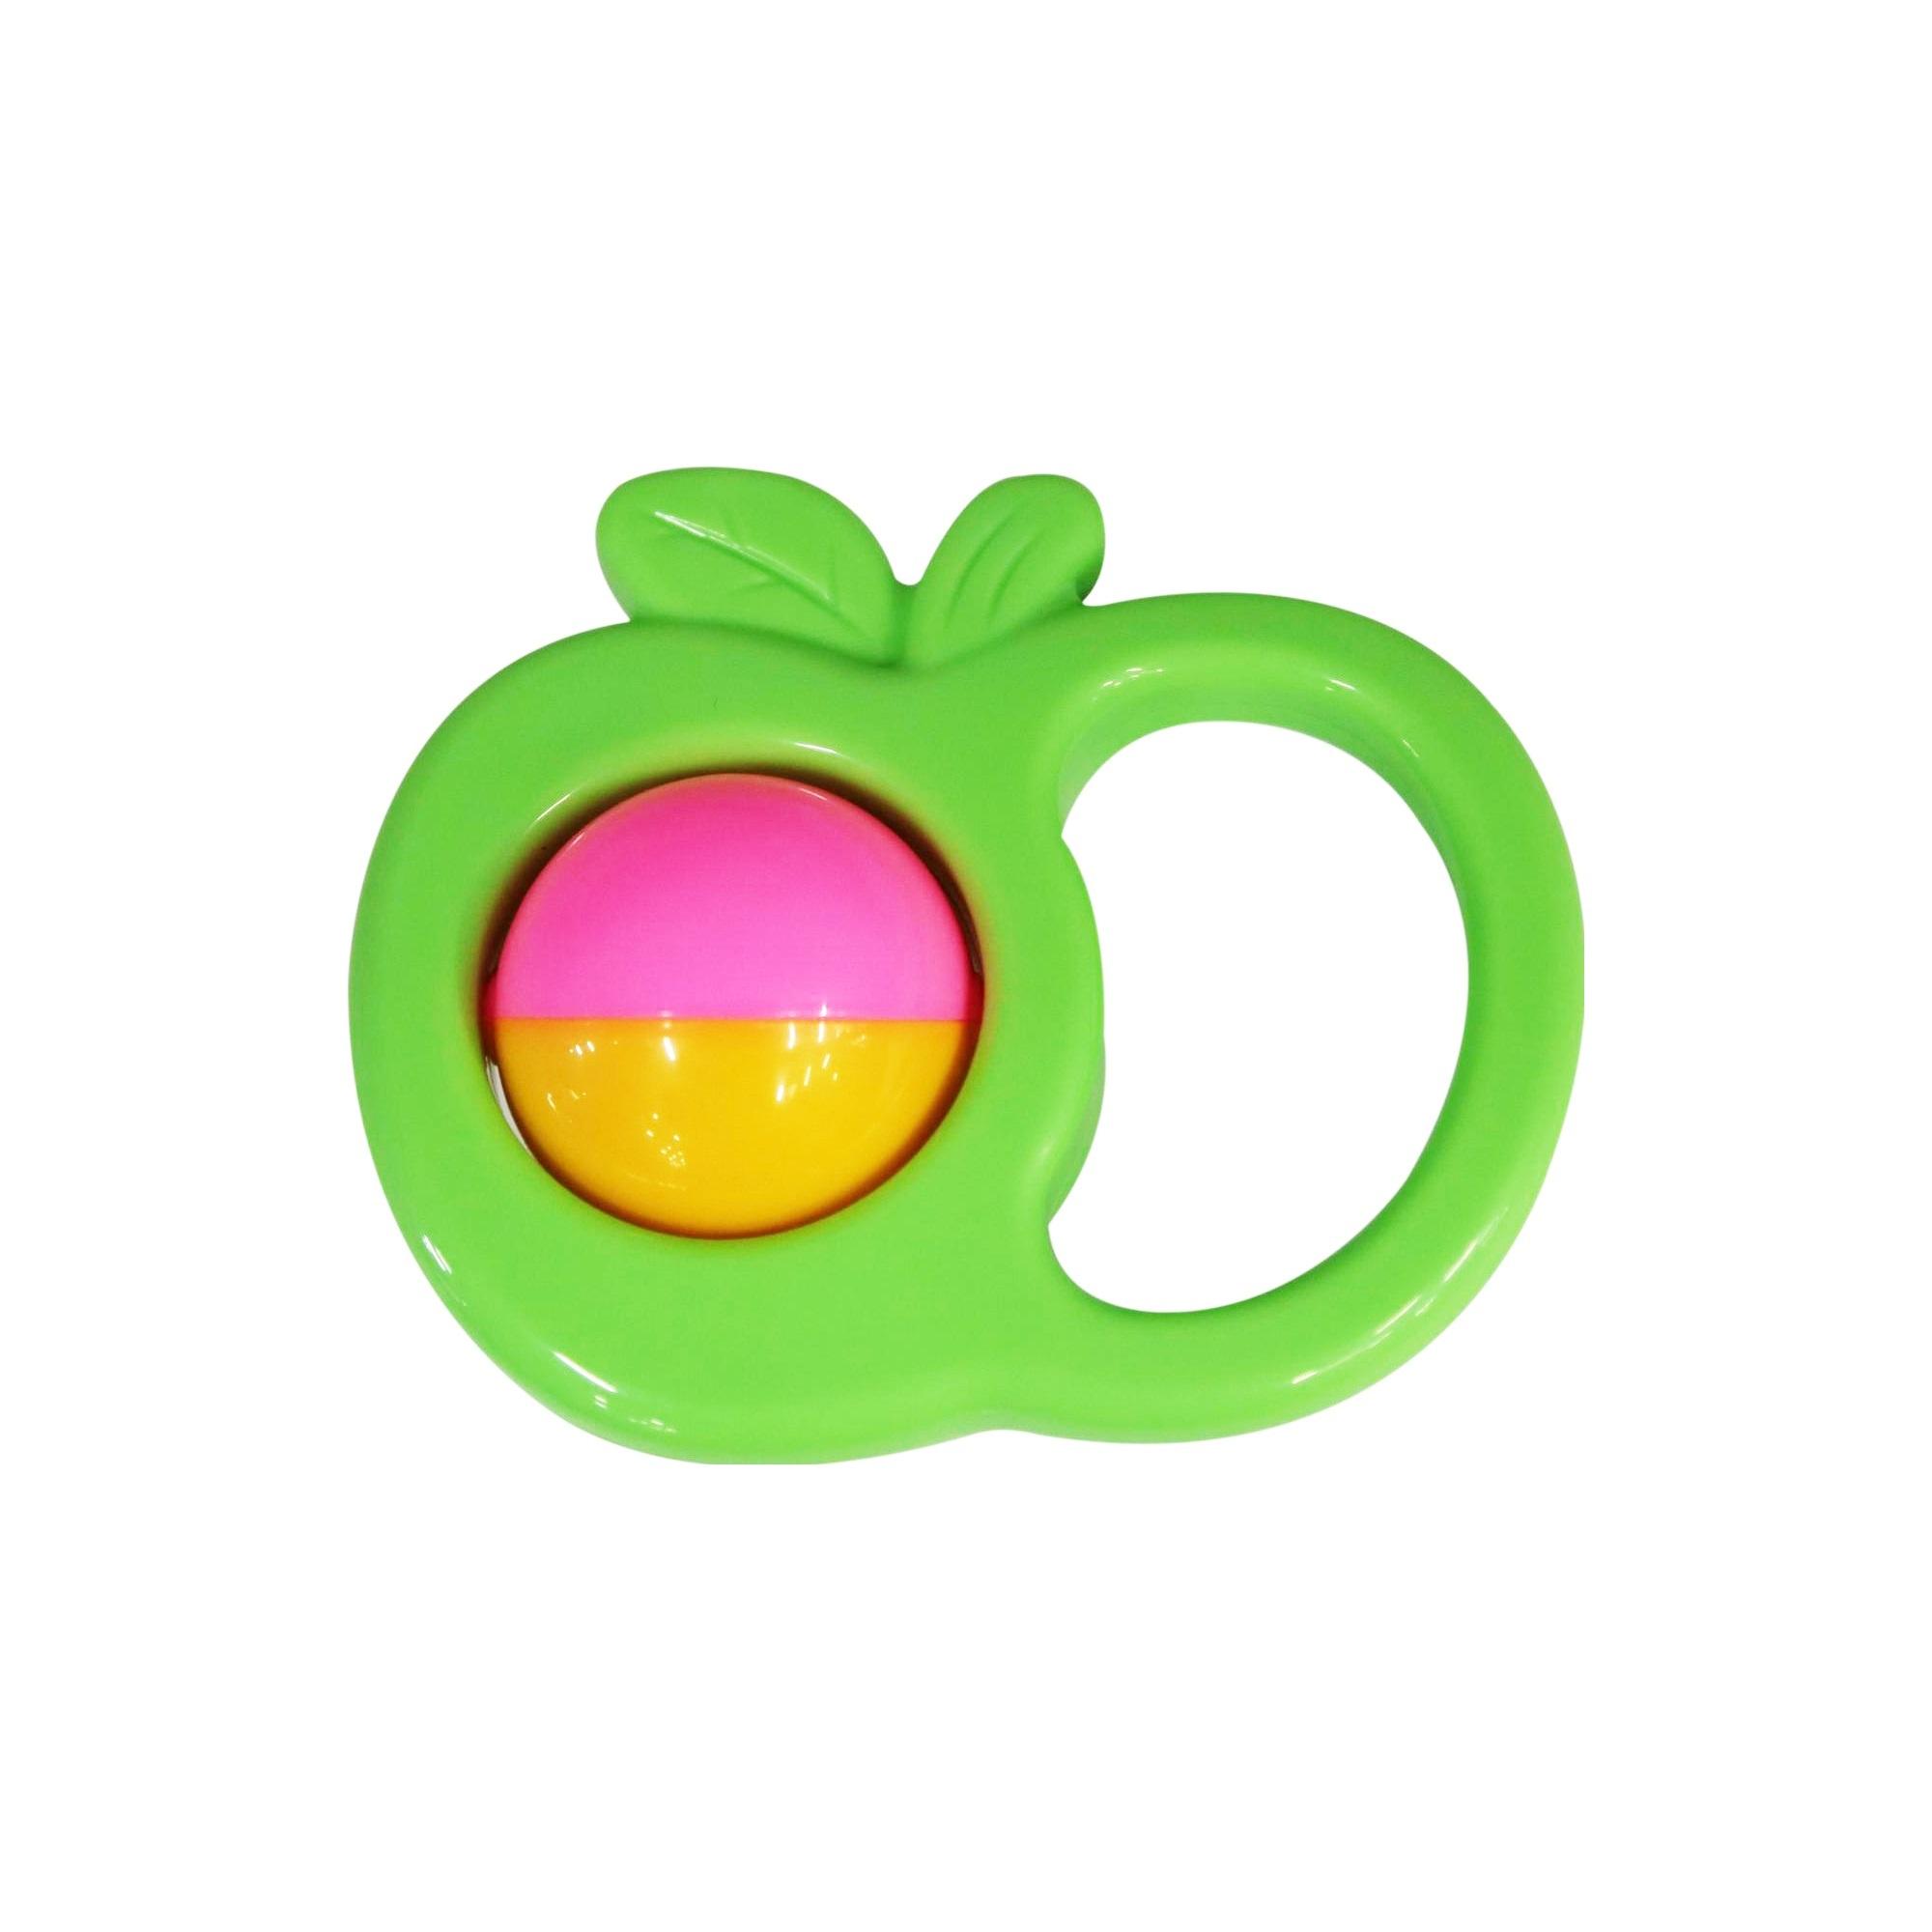 xúc xắc trái táo polesie